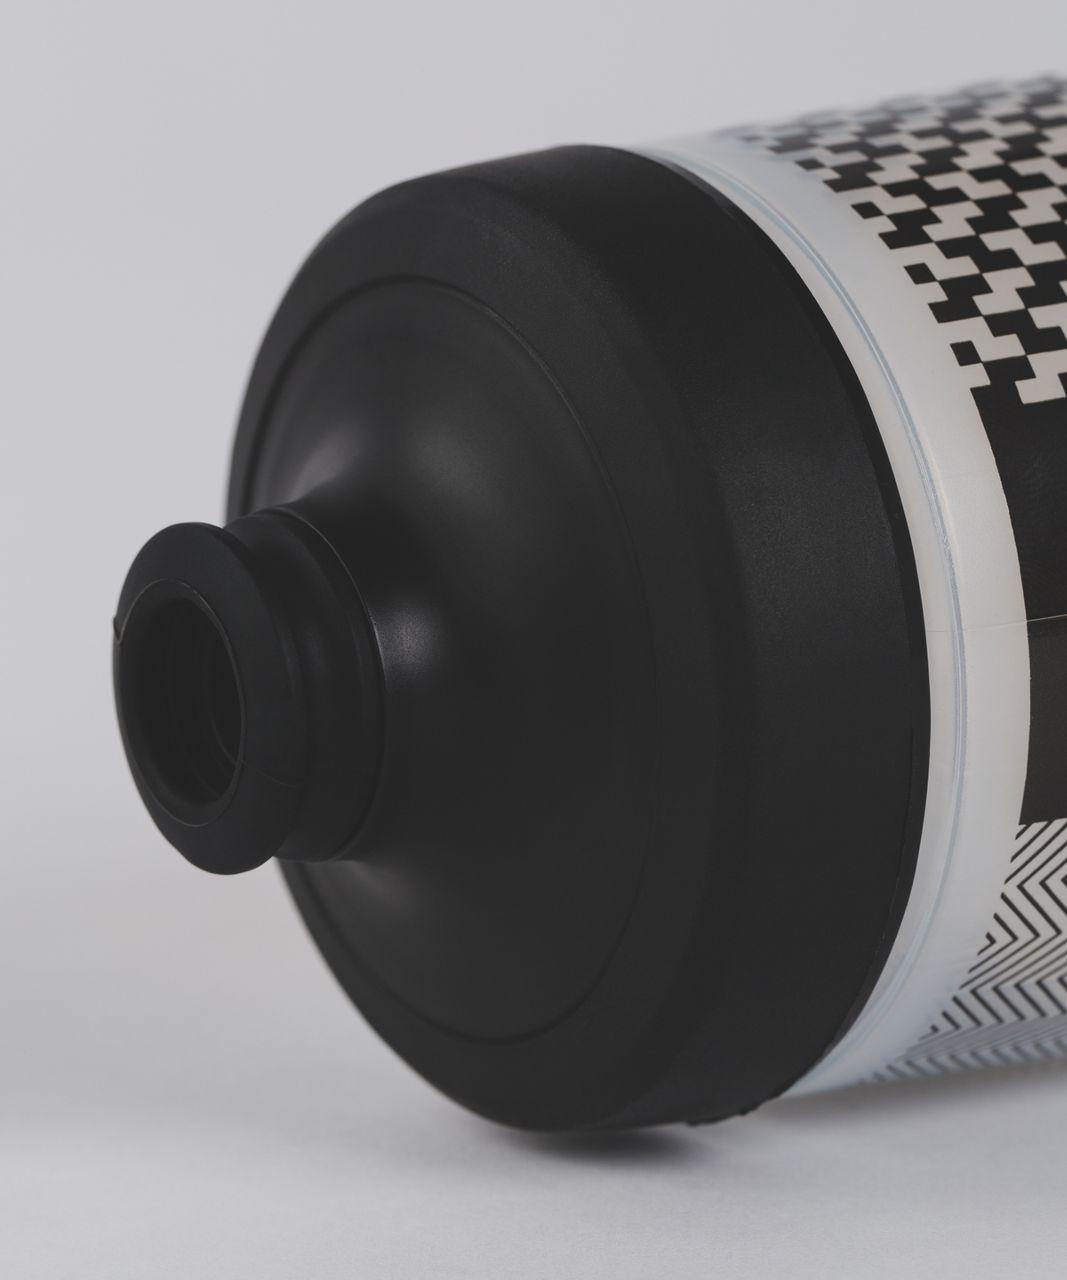 Lululemon Purist Cycling Water Bottle *26 oz - Gentlemen Pack Black